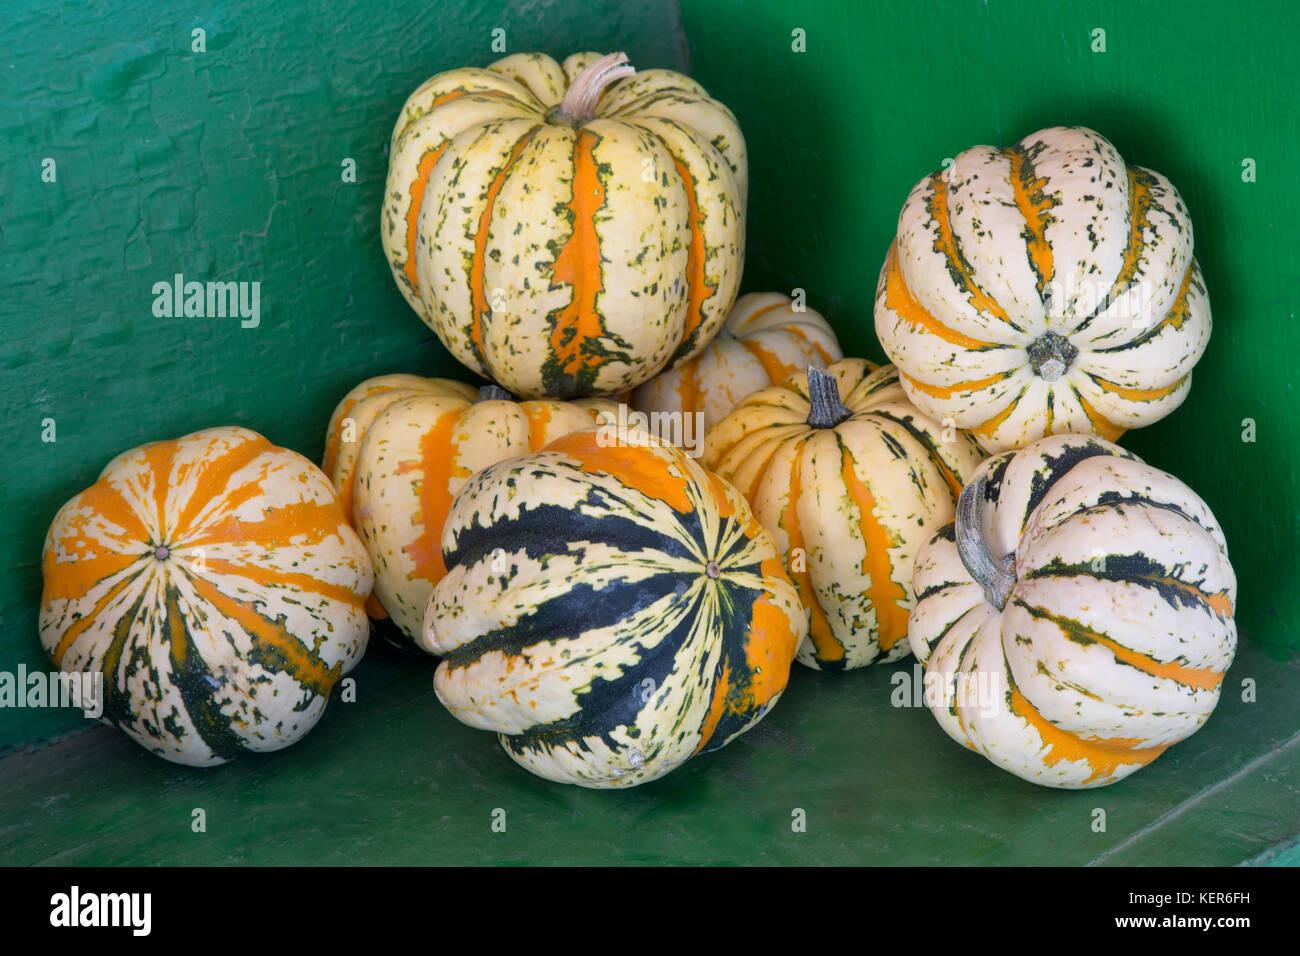 Harvested  Carnival winter squash 'Cucurbita pepo'. - Stock Image